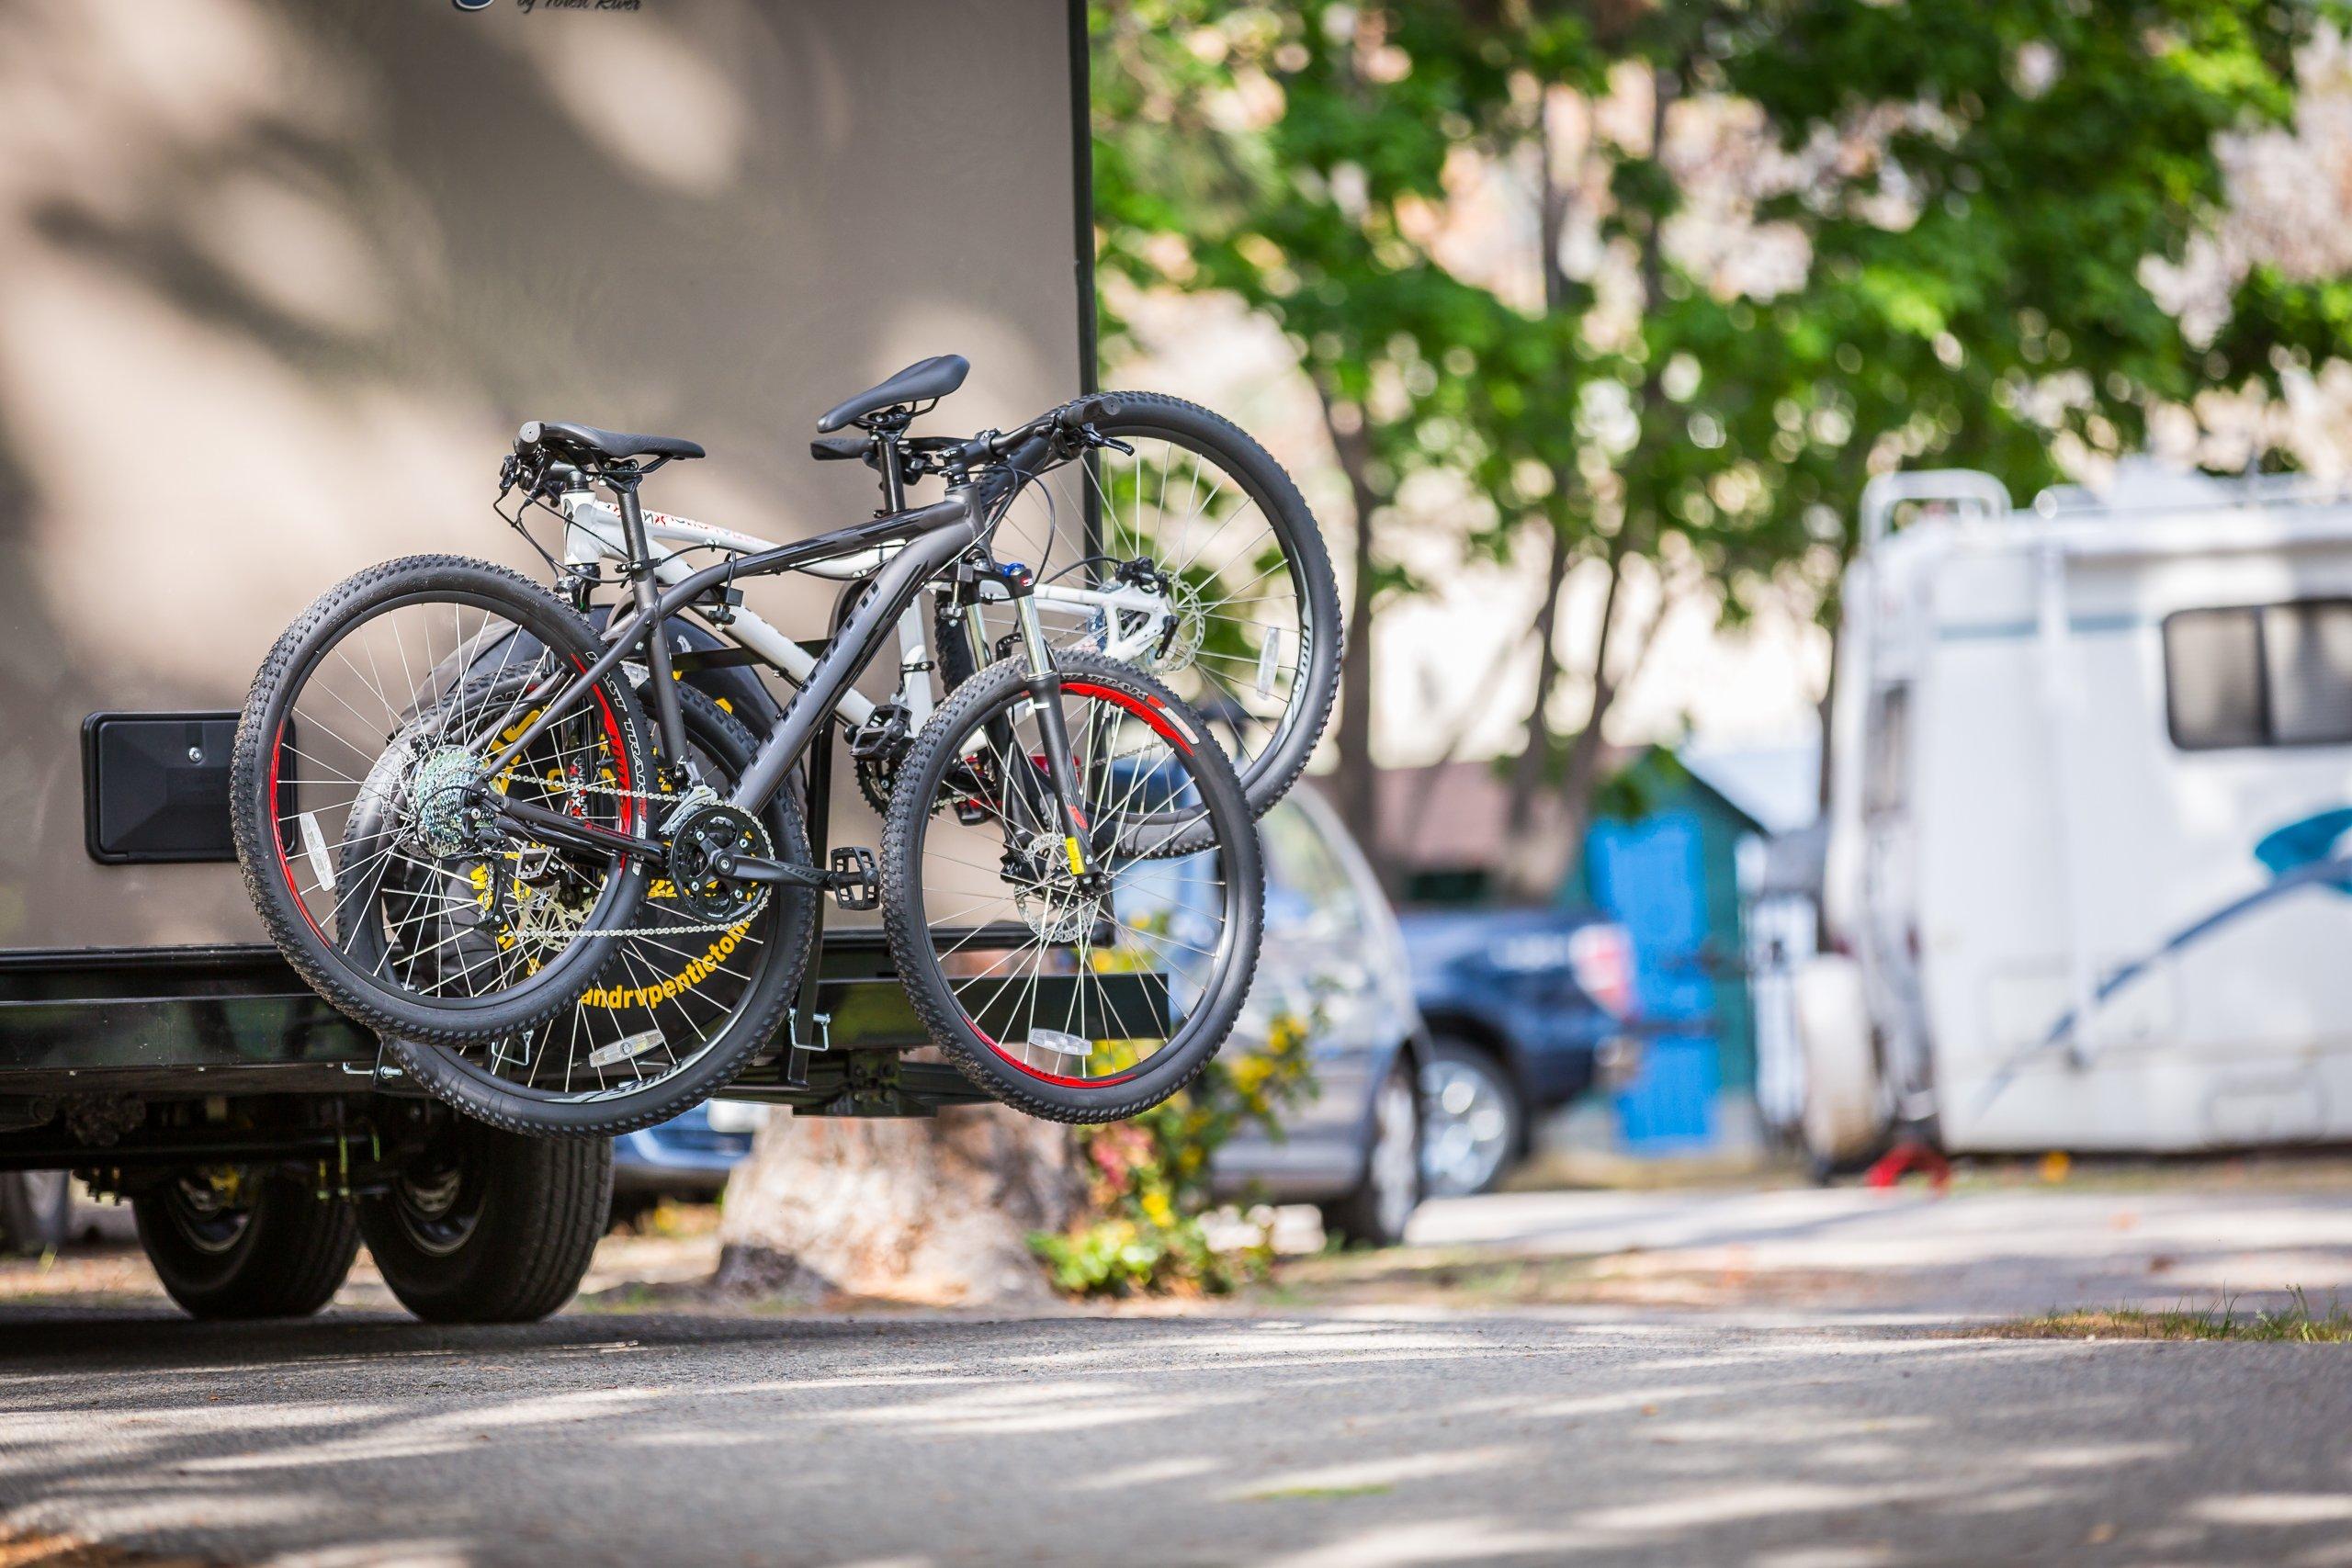 Swagman RV Approved Around the Spare Bike Rack